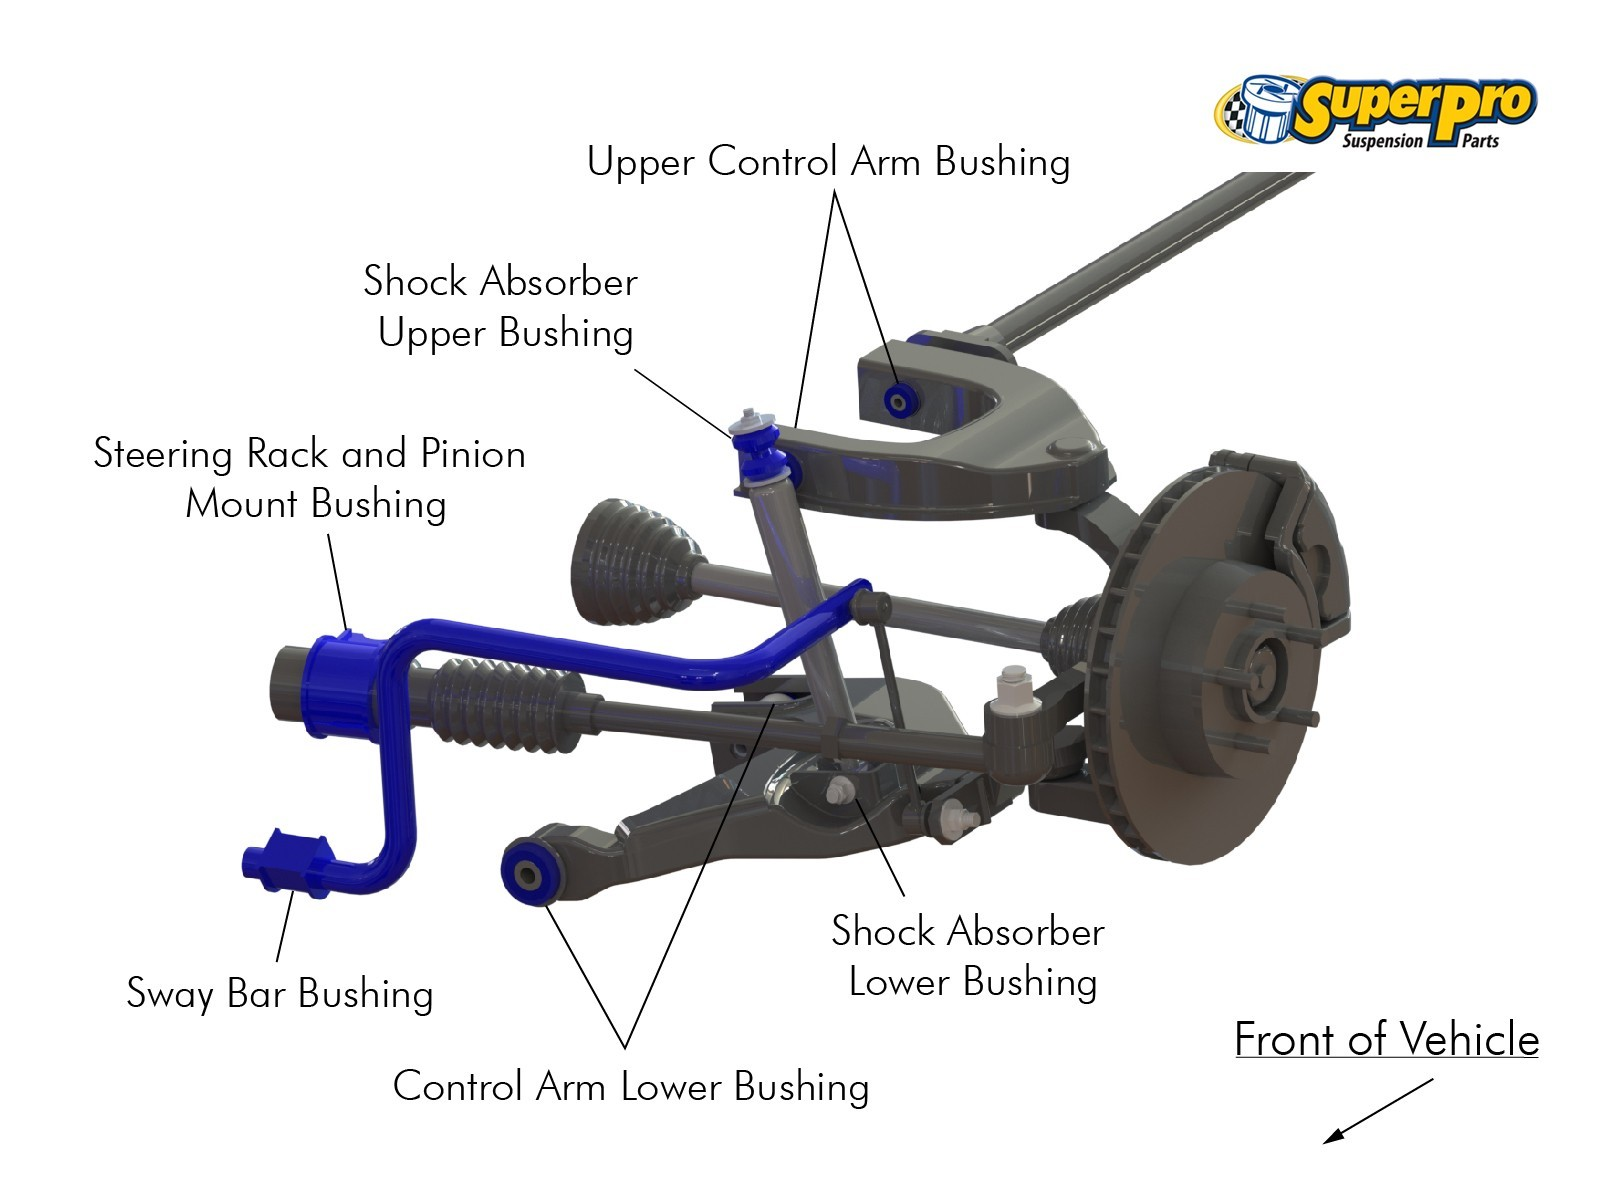 Car Parts Diagram Suspension Diagram Parts Under A Car Superpro Tradeview Suspension Part Of Car Parts Diagram Suspension